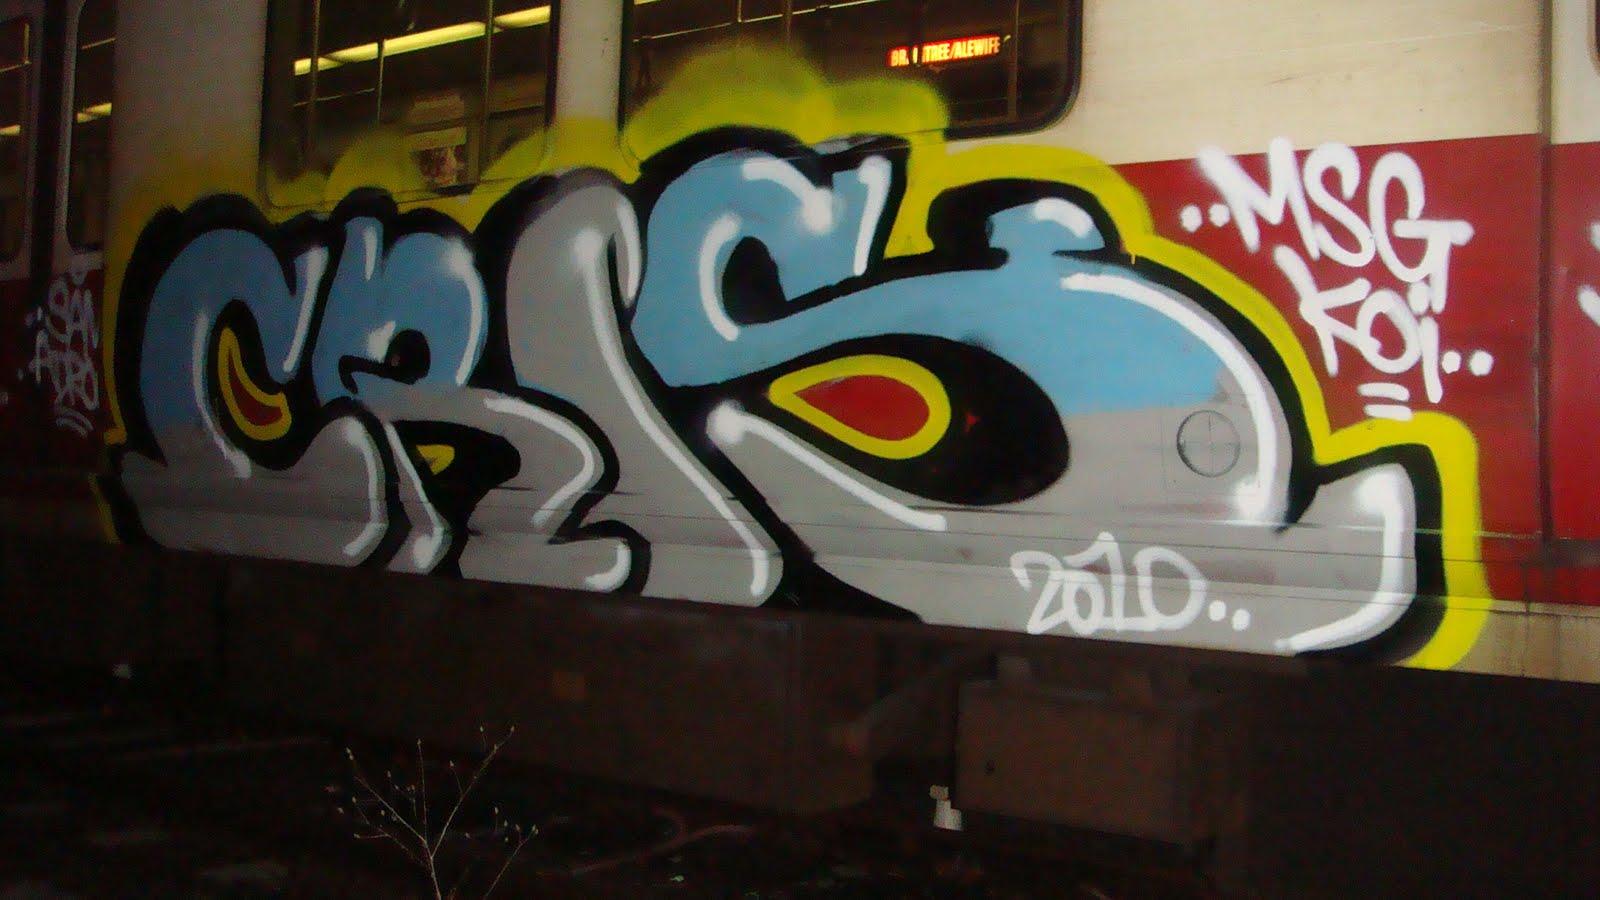 a1.bp.blogspot.com__rKBnCrs1OYs_S5GHwrzDMdI_AAAAAAAAH6o_grw6KzQoukc_s1600_boston_2B_20_.JPG